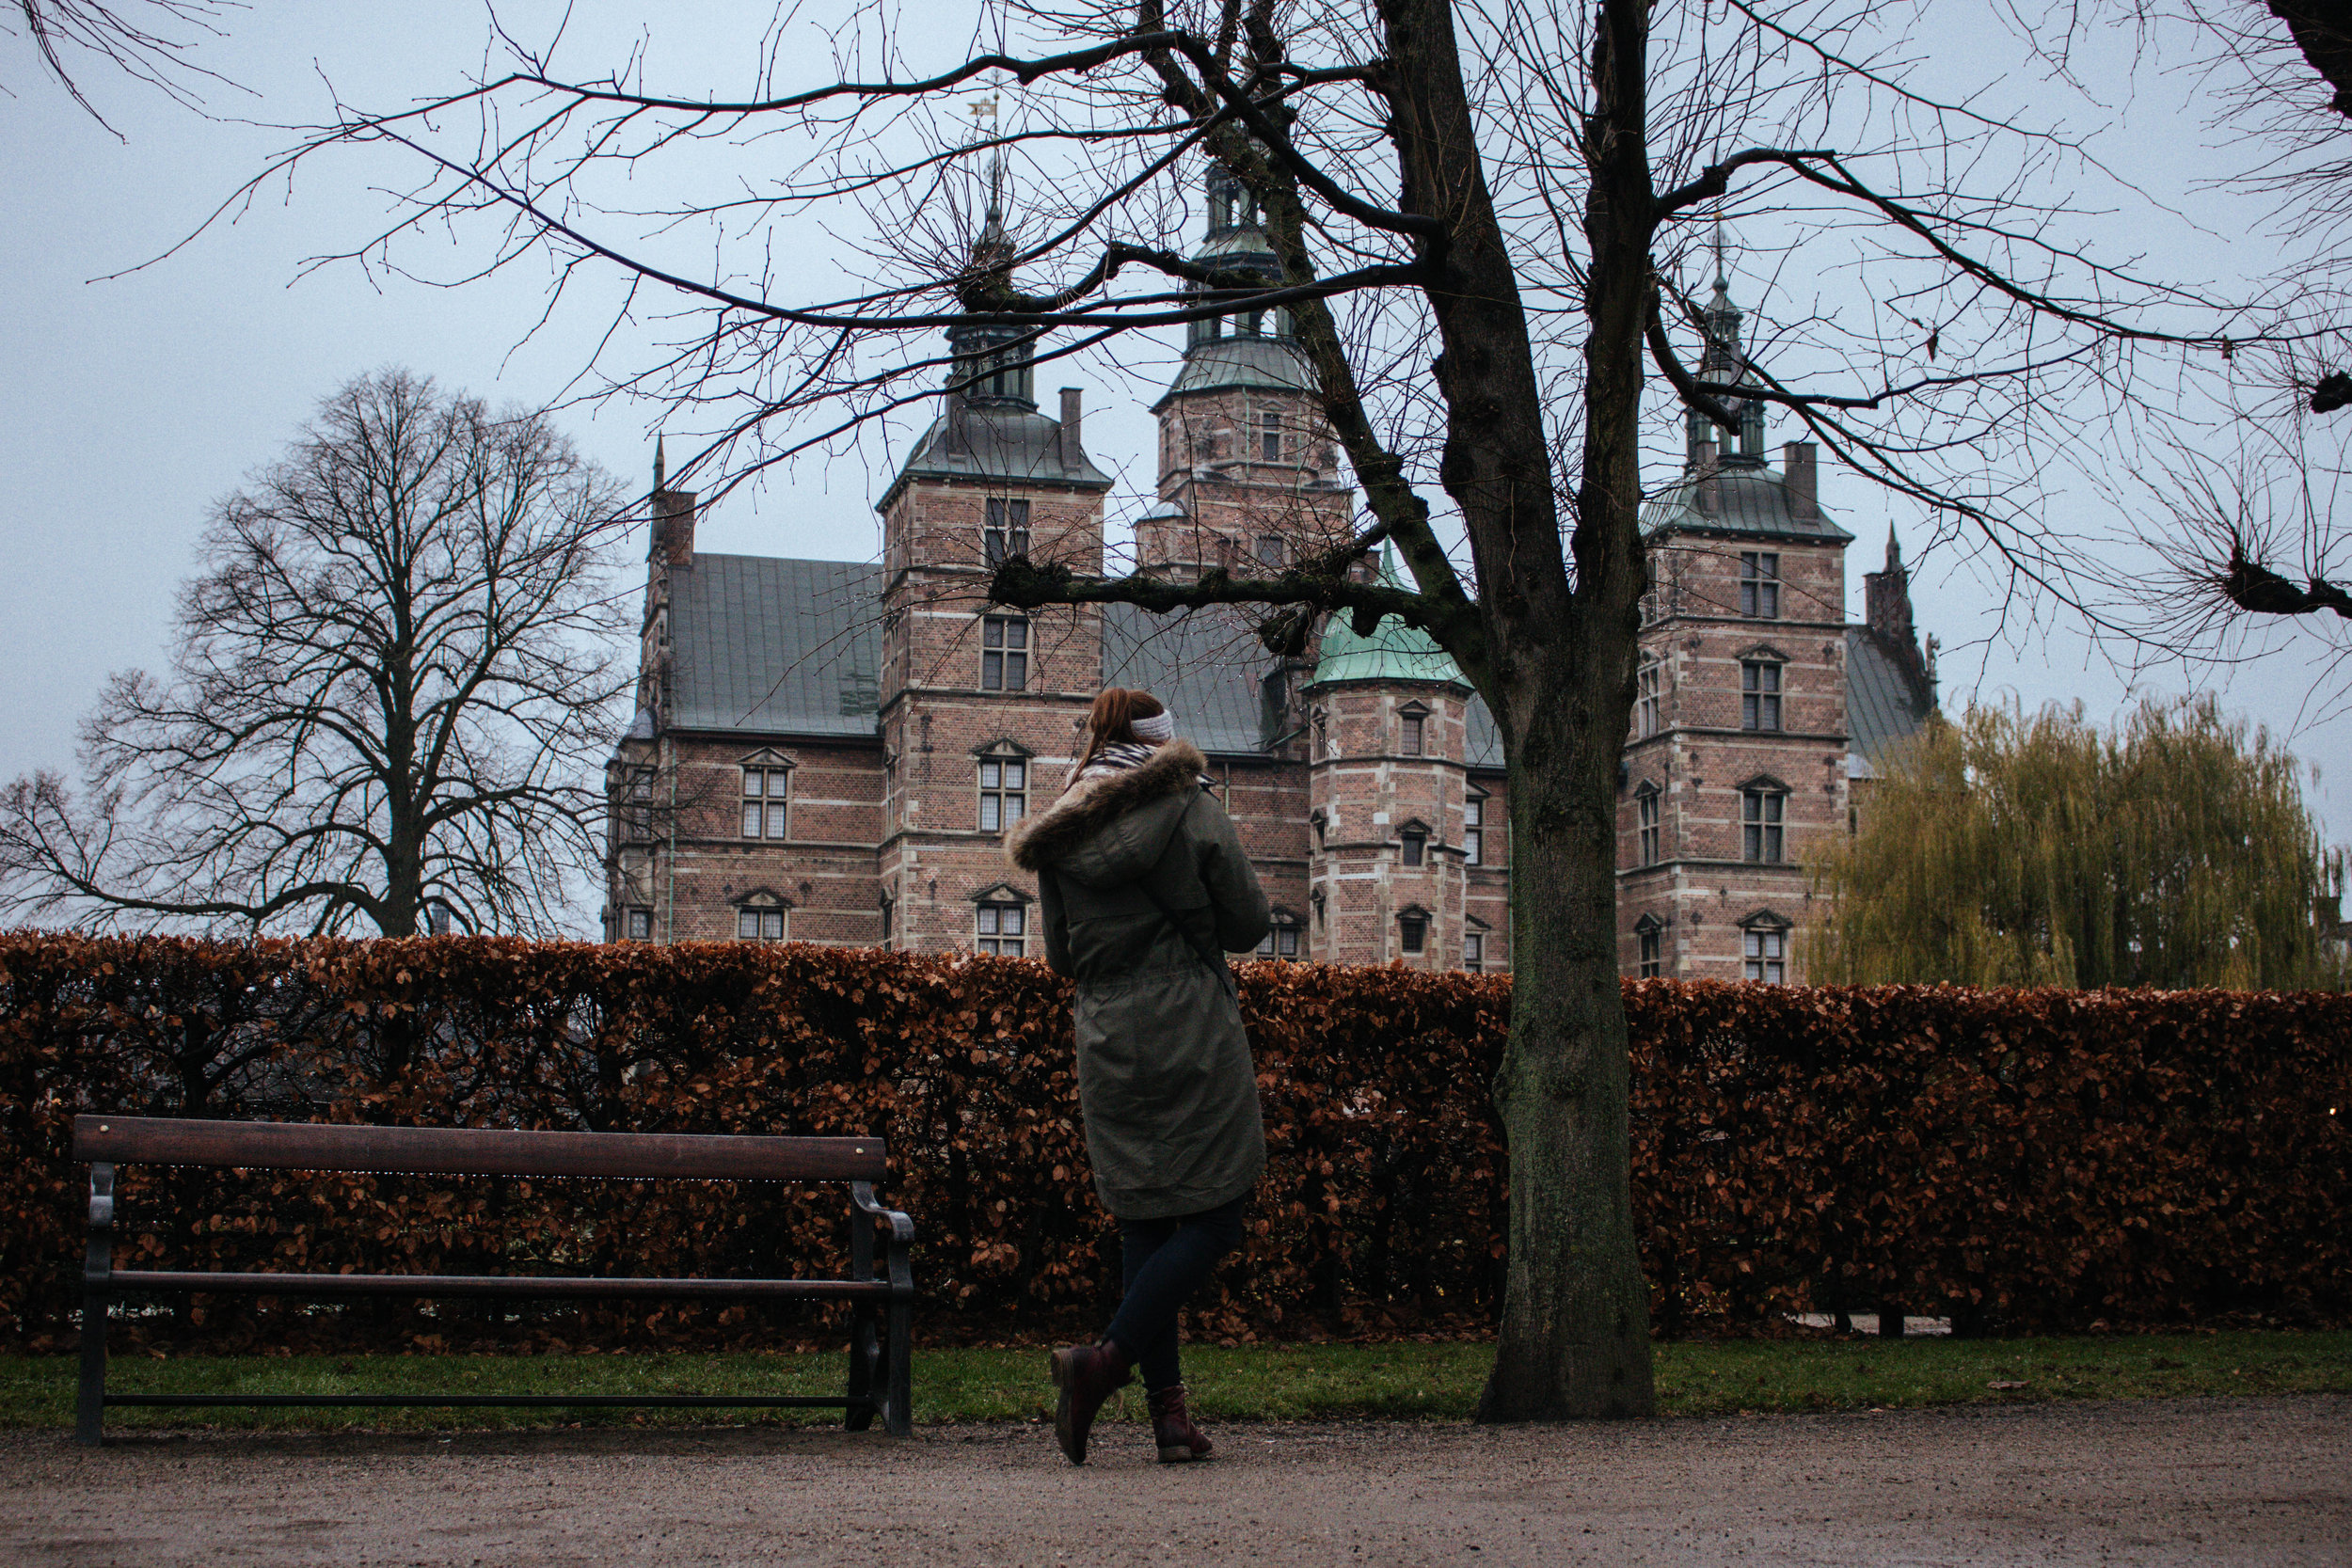 rosenborg castle on a rainy day